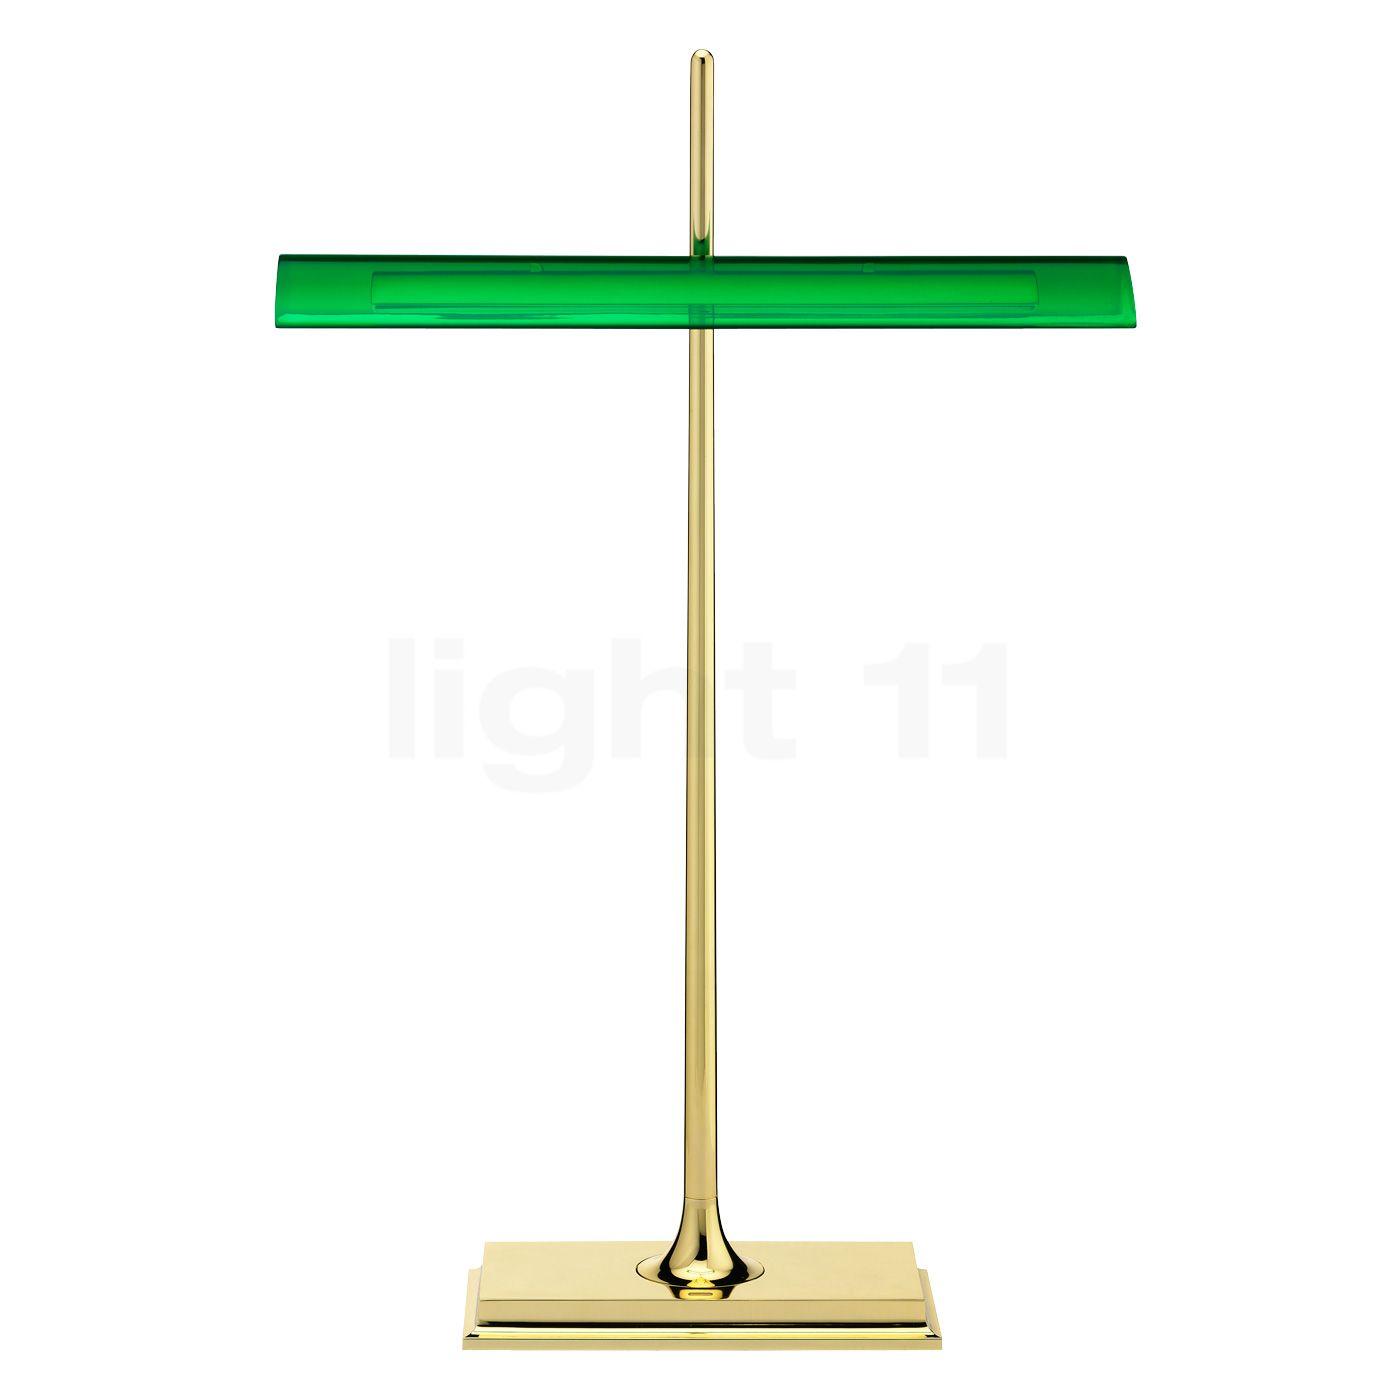 Flos Goldman Tavolo Led Desk Lamps Buy At Light11 Eu